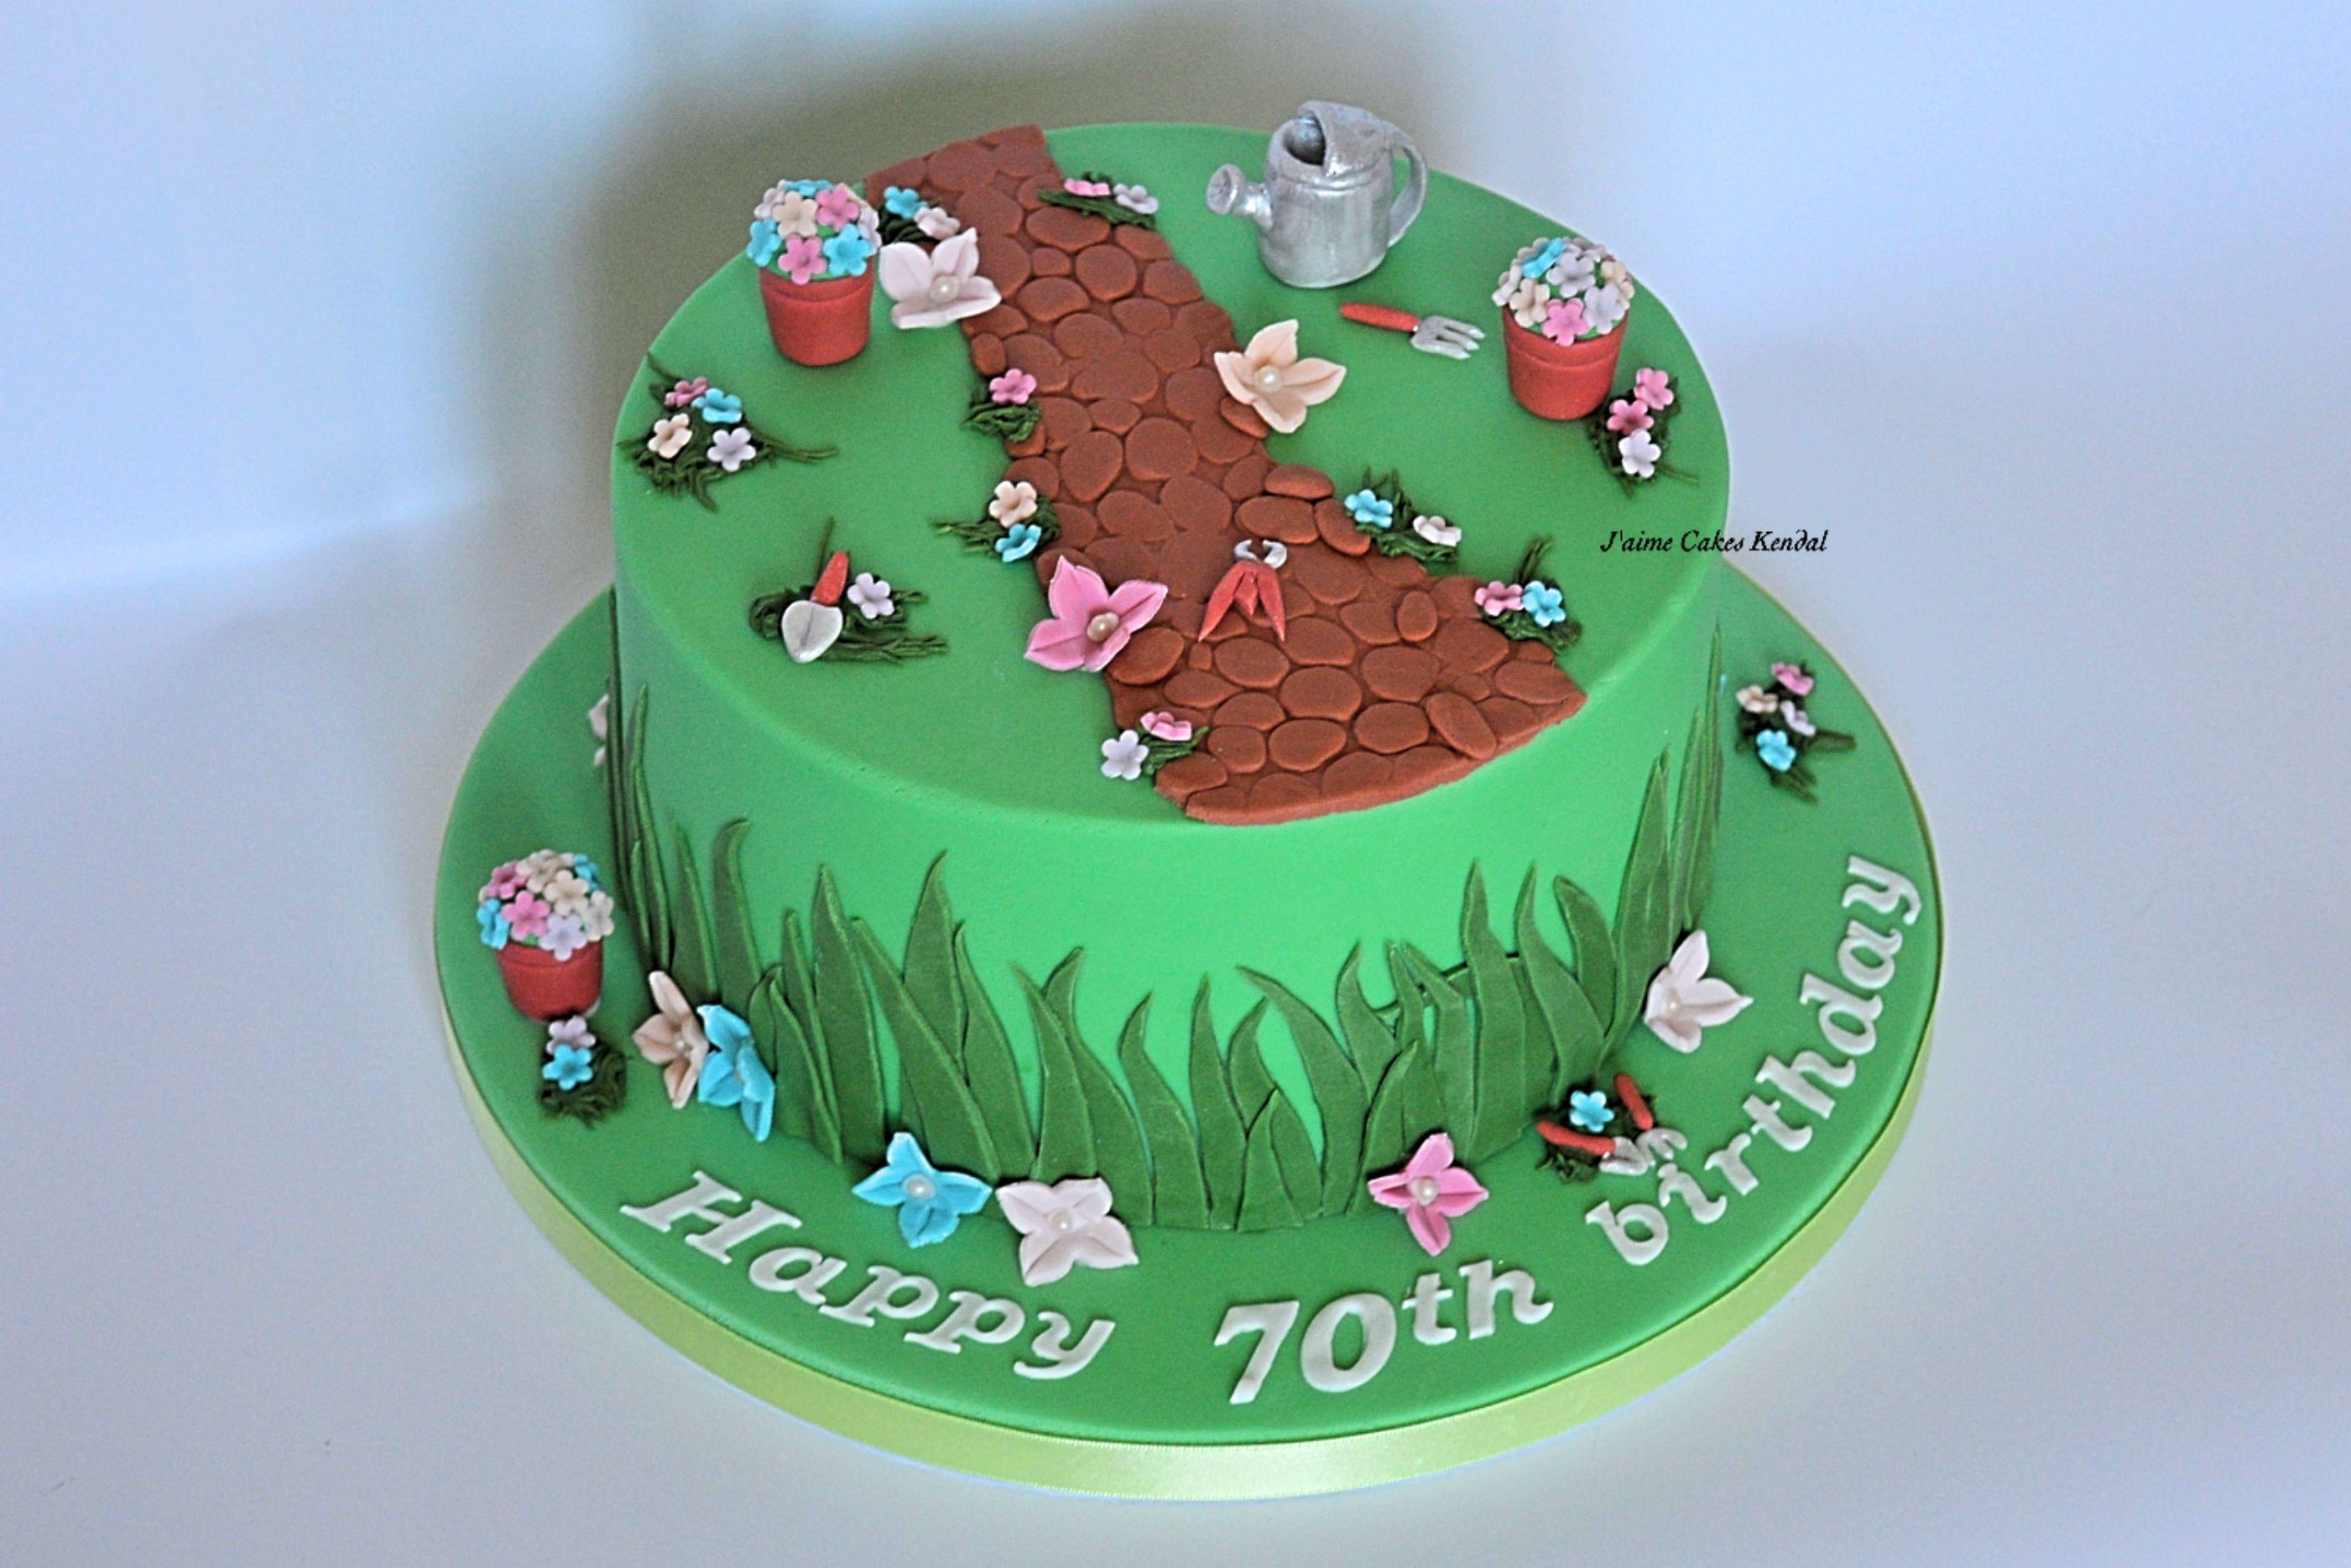 Garden cake Ladies 70th birthday httpwwwjaimecakeskendalcouk